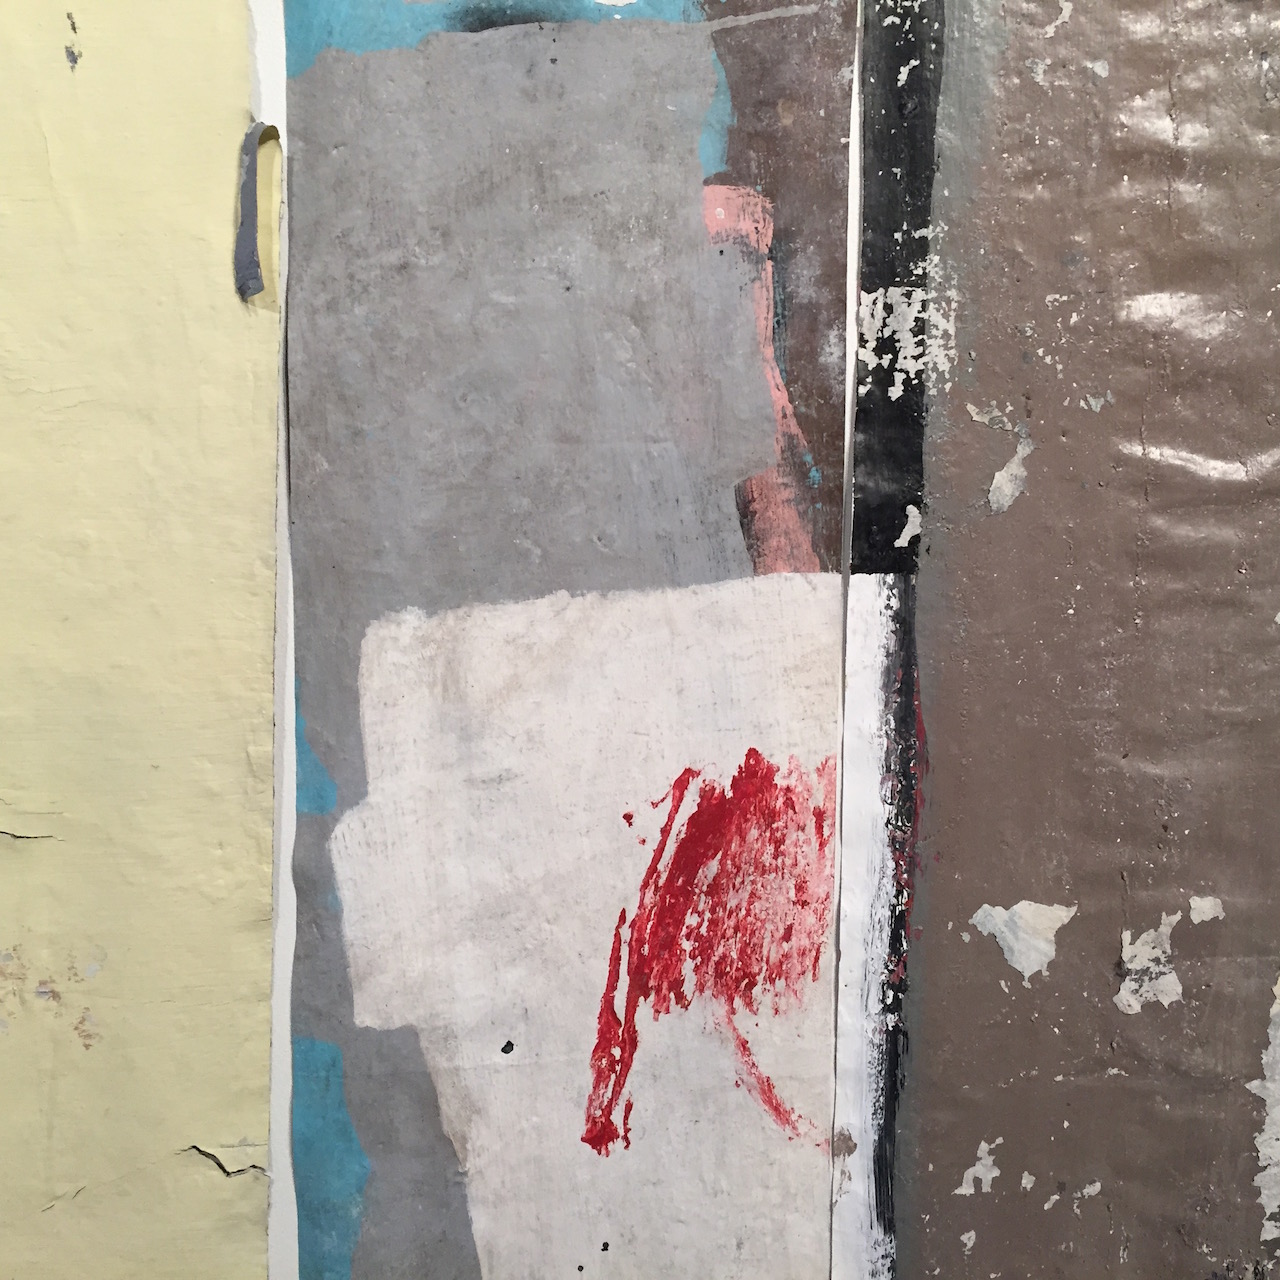 Detail of work by Pablo Rasgado at Disjecta